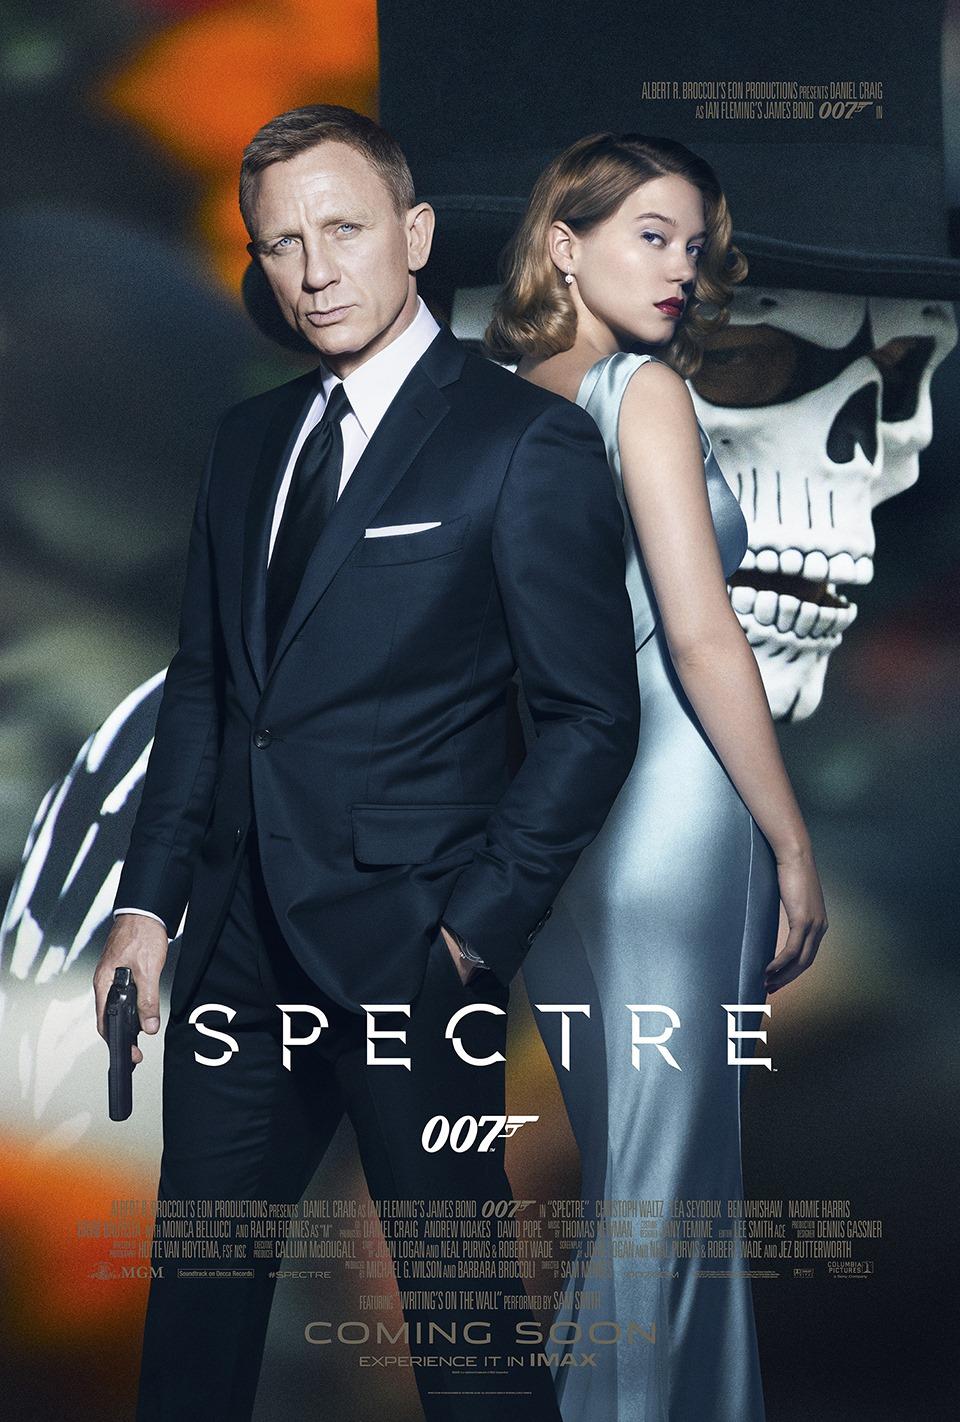 Daniel Craig Joins Lea Seydoux for New 'Spectre' Poster Artwork